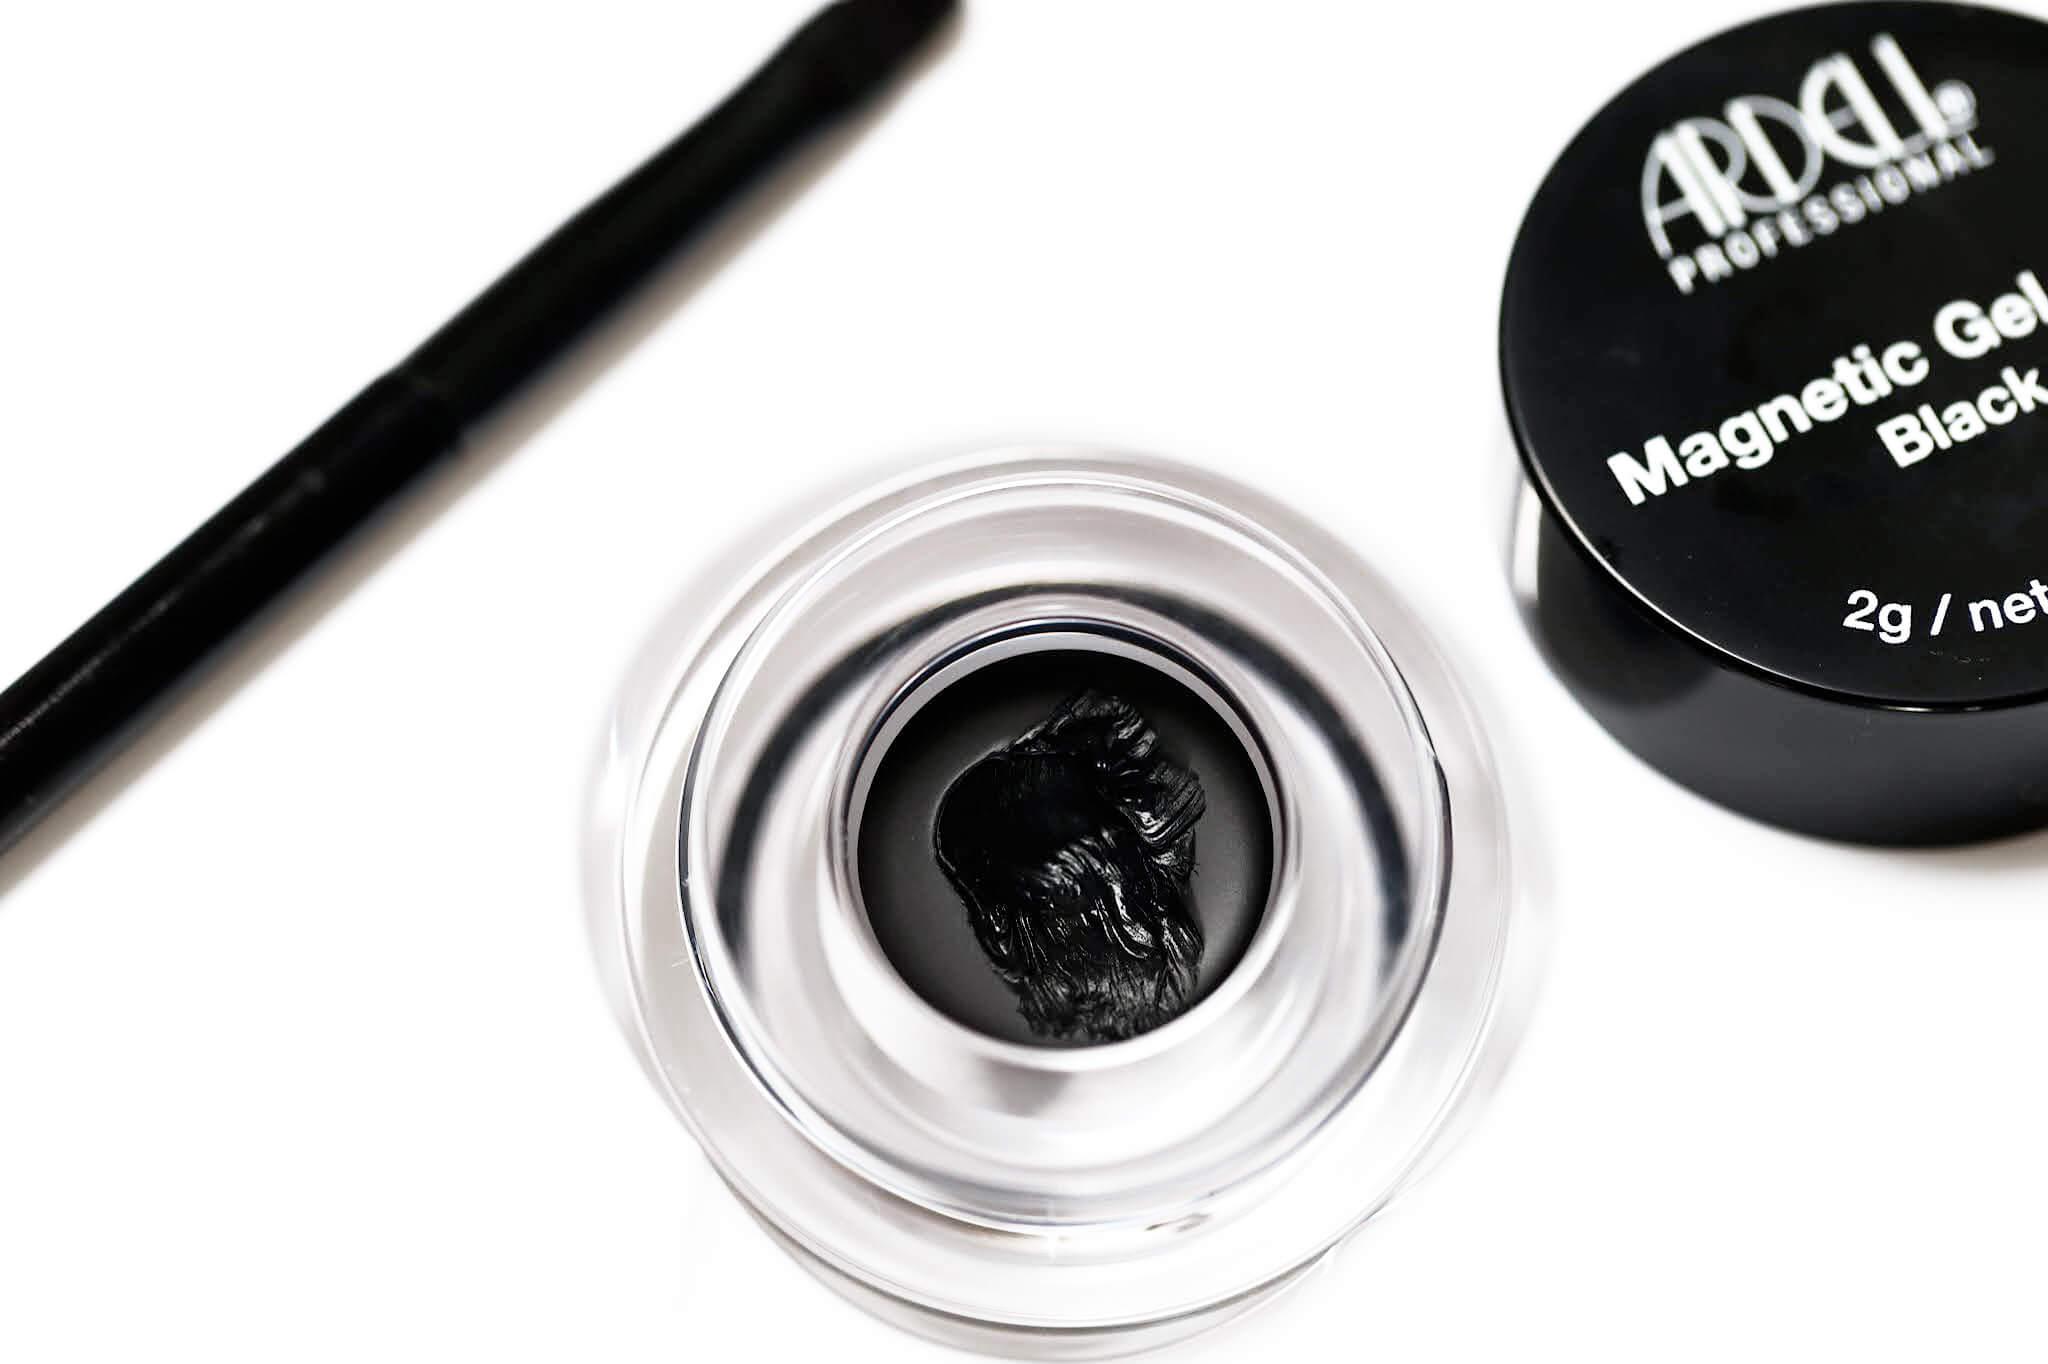 Faux Cils Magnetiques Ardell eyeliner